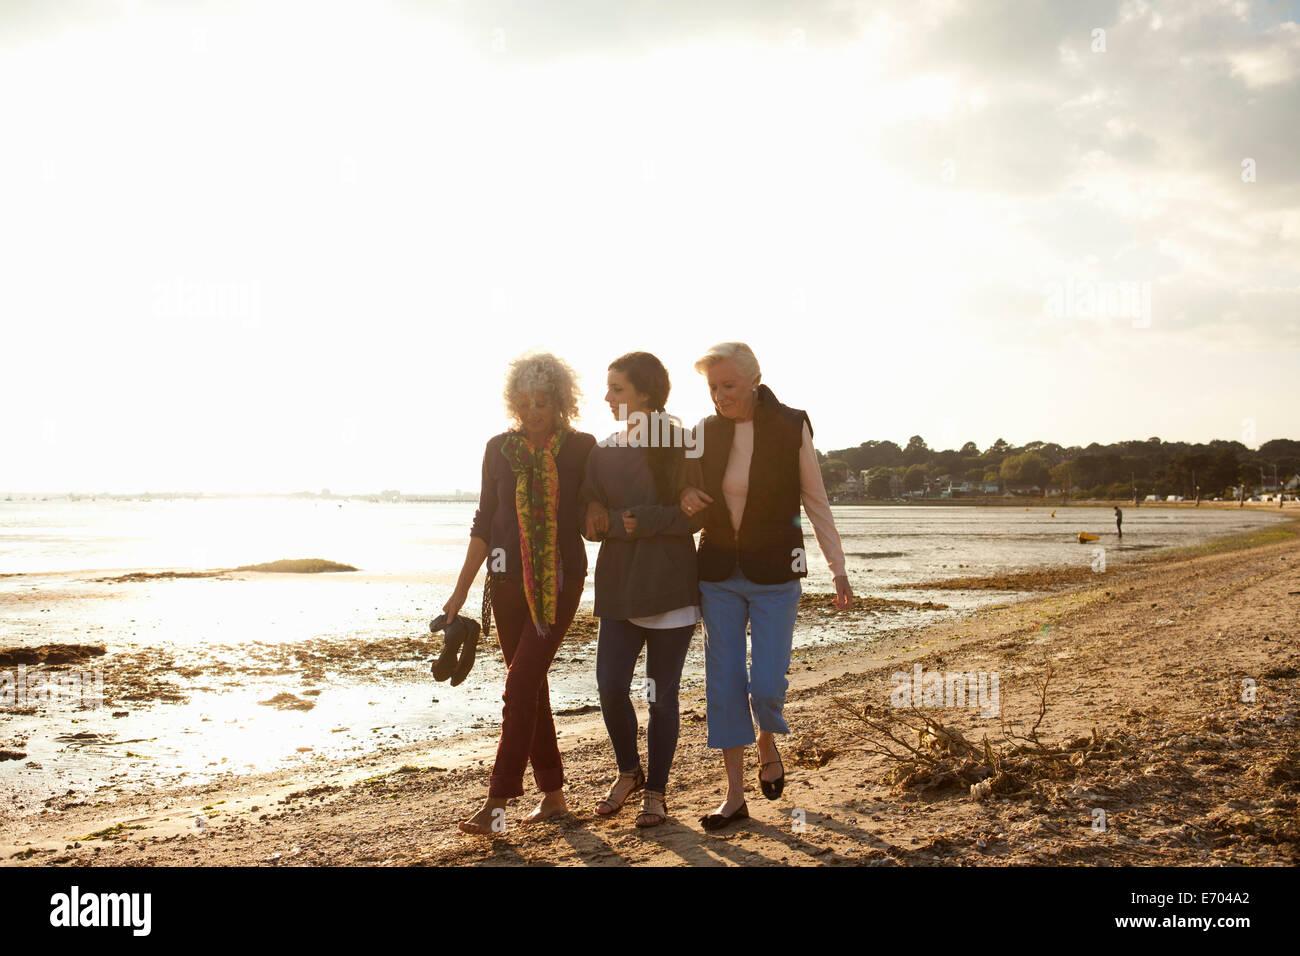 Female family members walking on beach - Stock Image